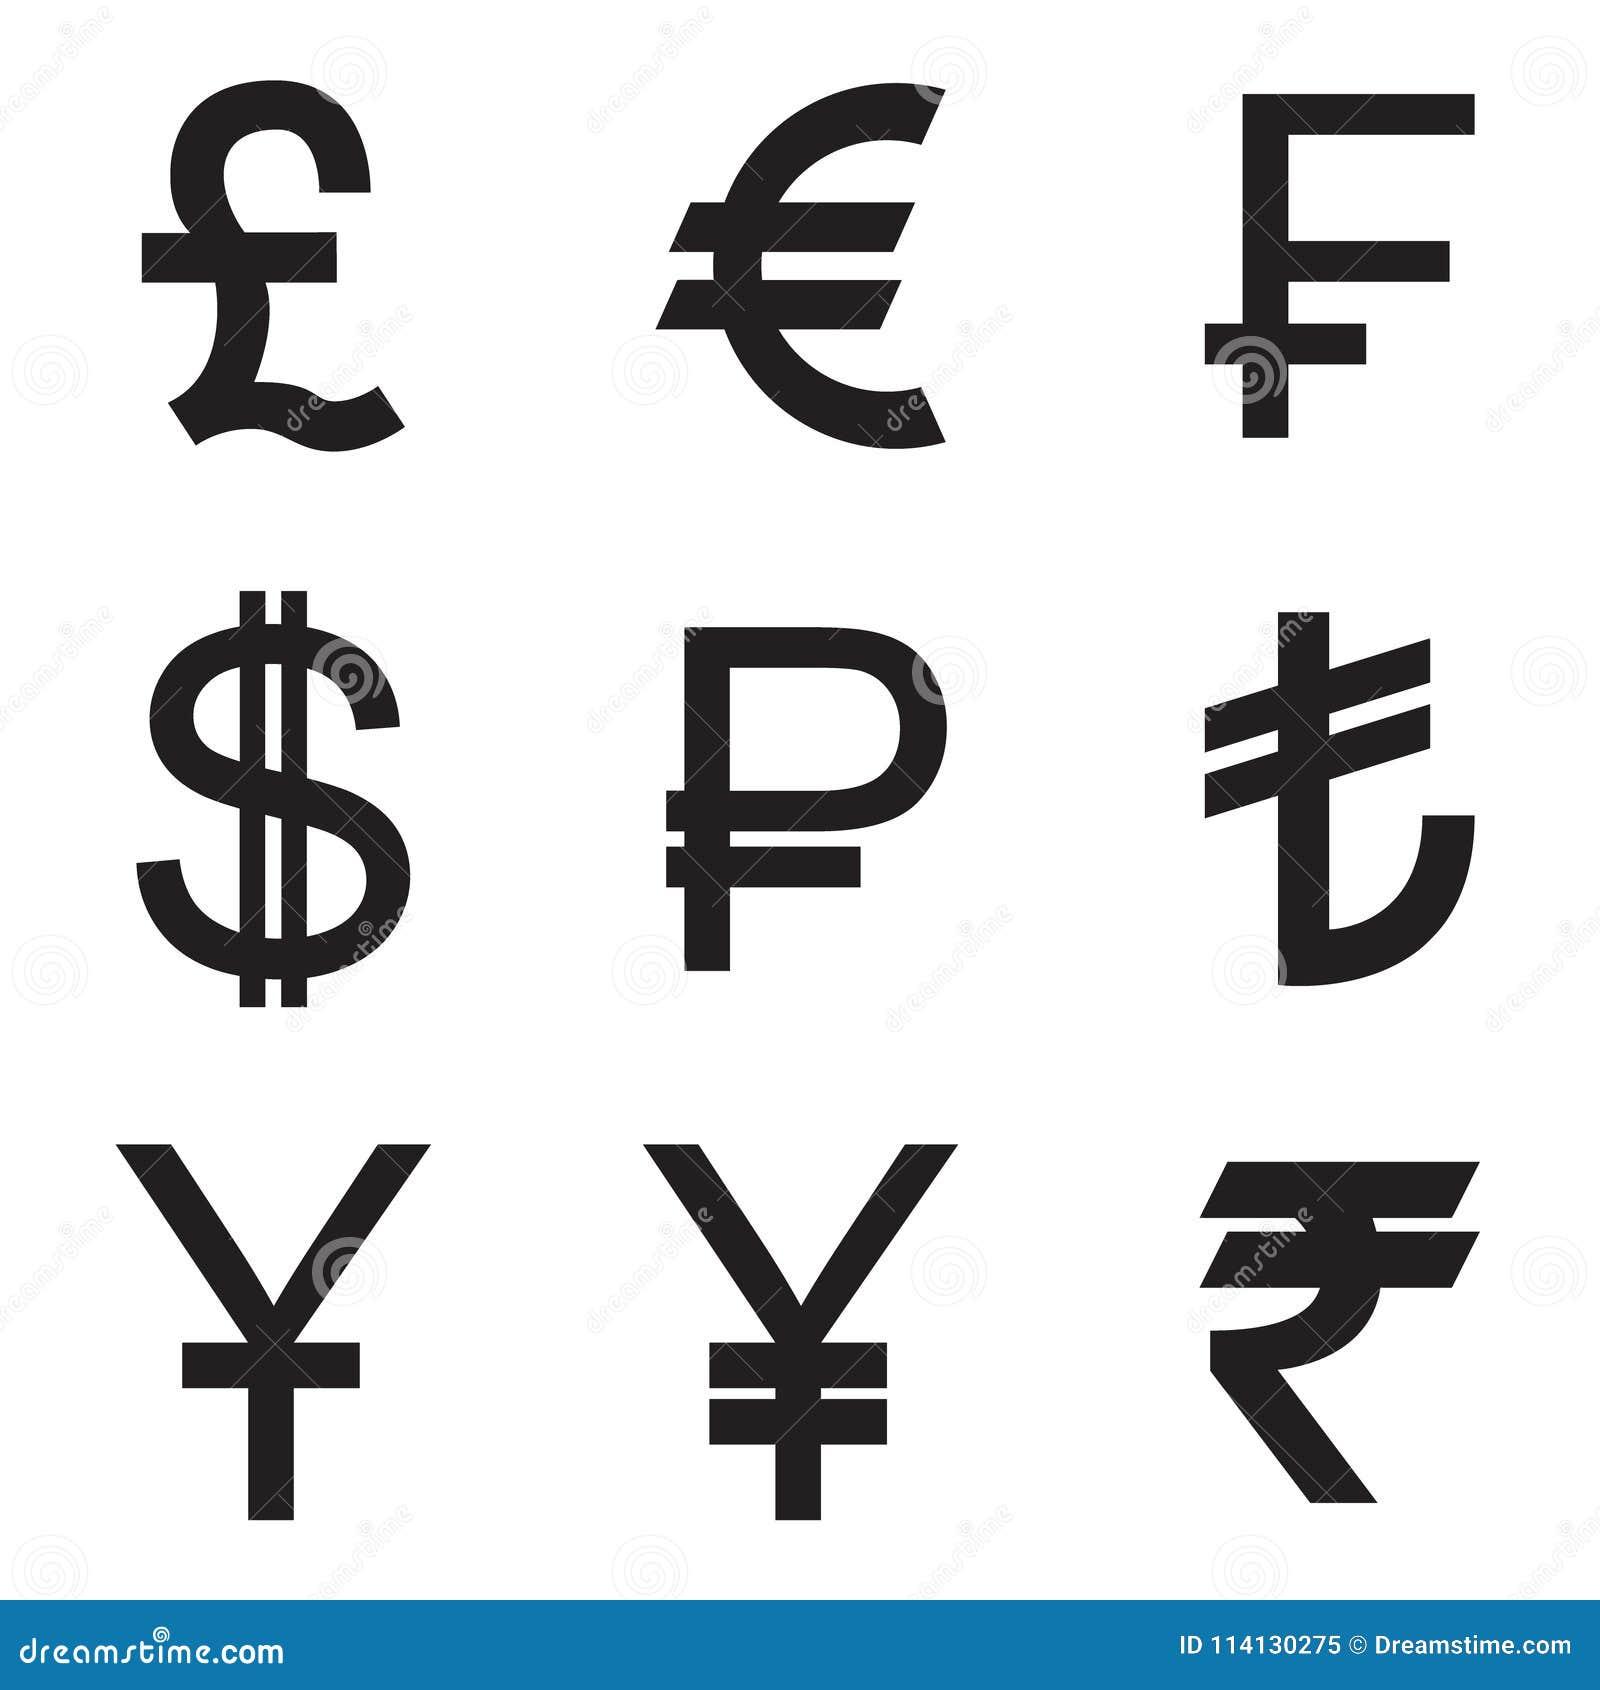 Icones De Devise Reglees Livre Euro Franc Dollar Rouble